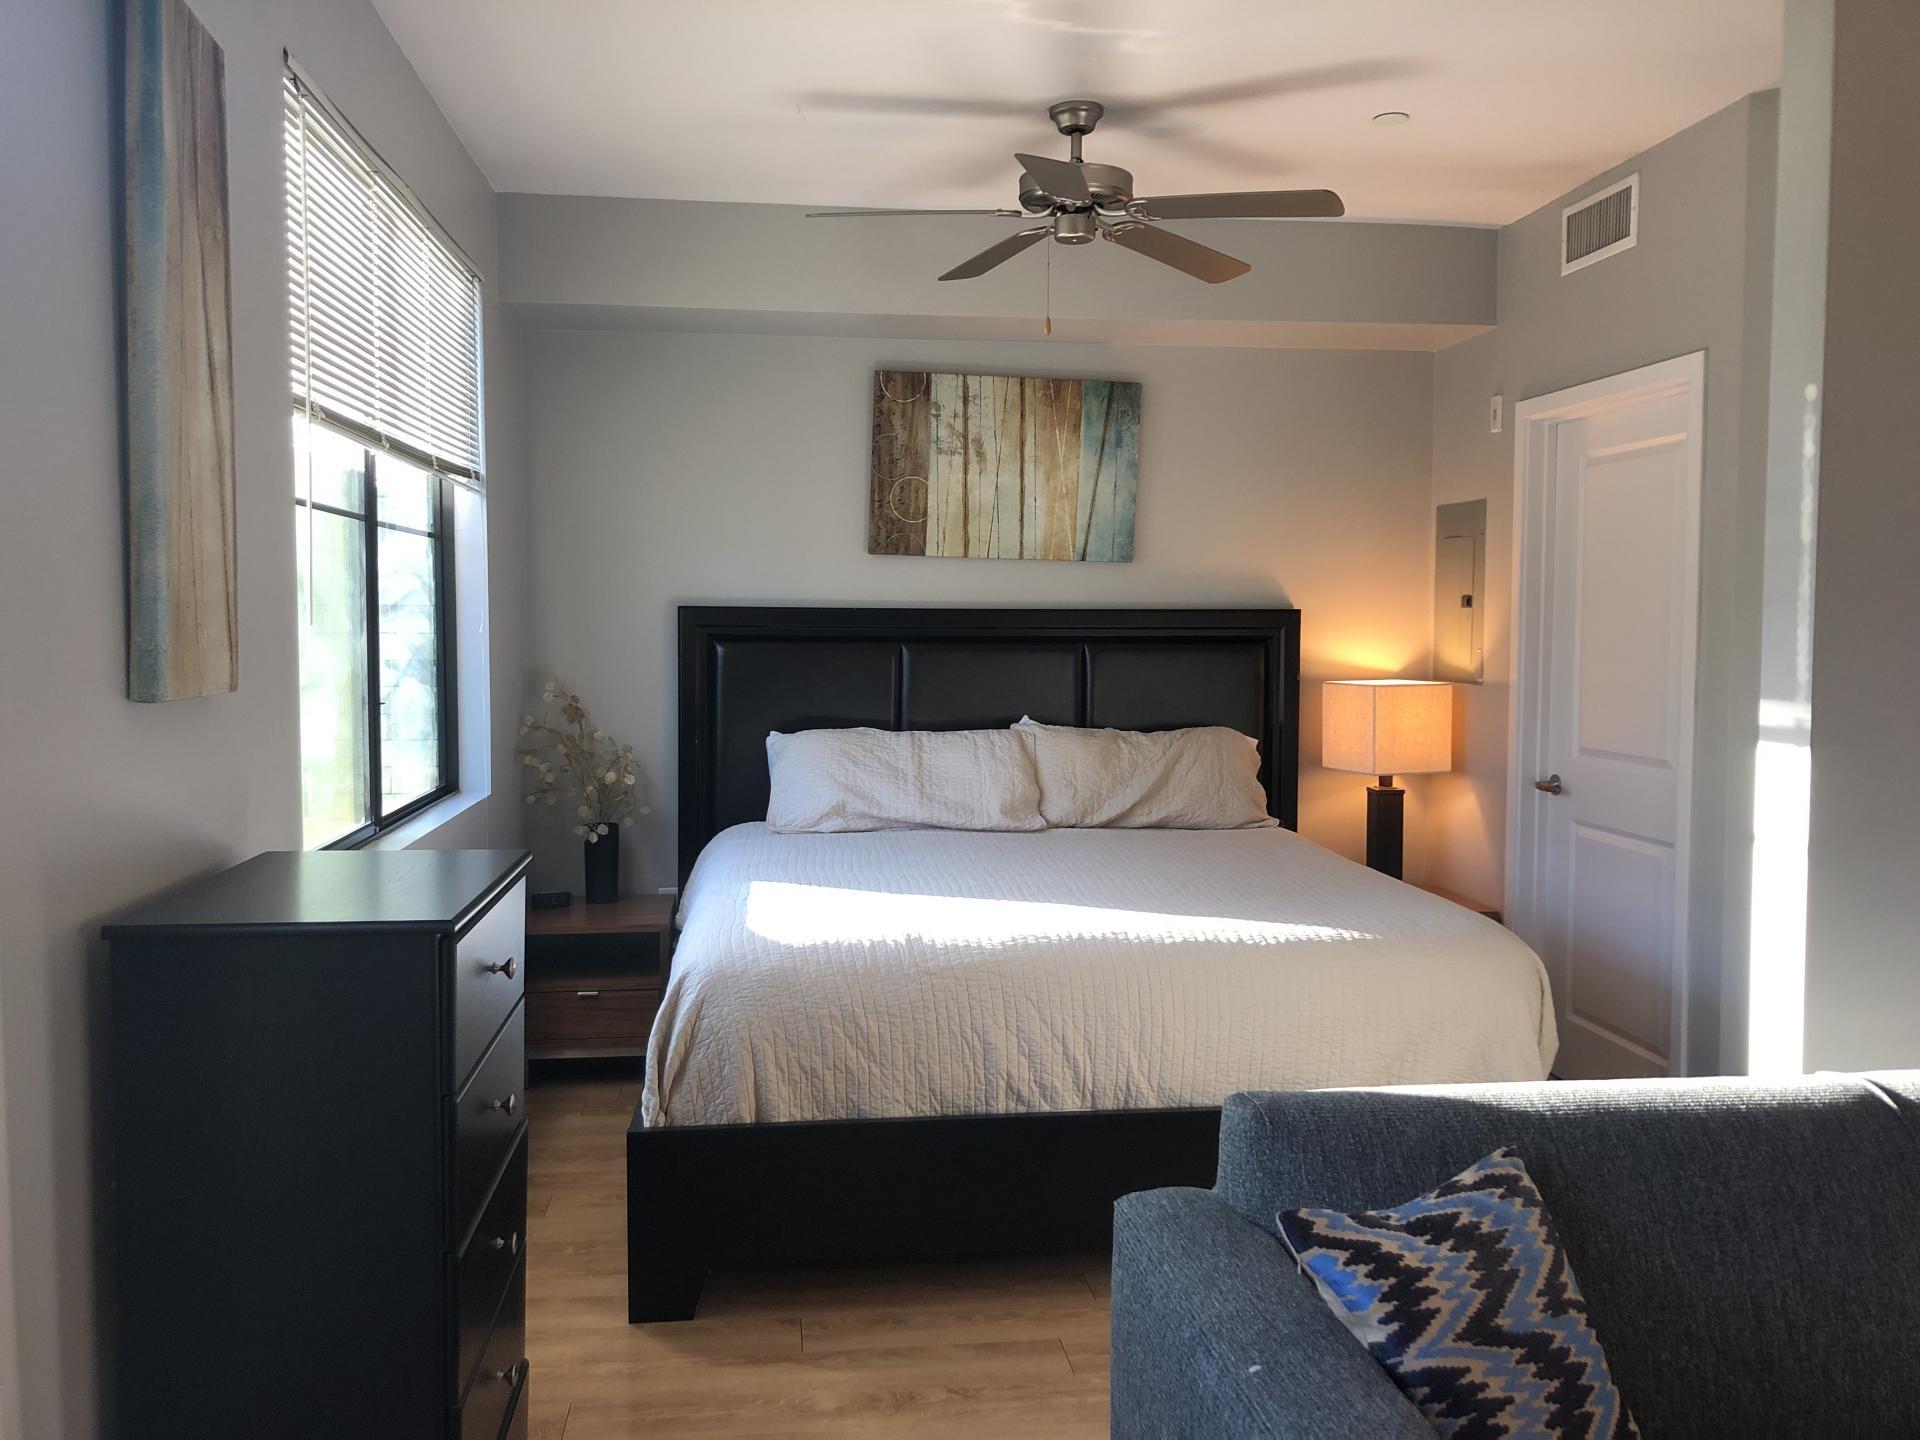 Bedroom at Biltmore at Camelback Apartments